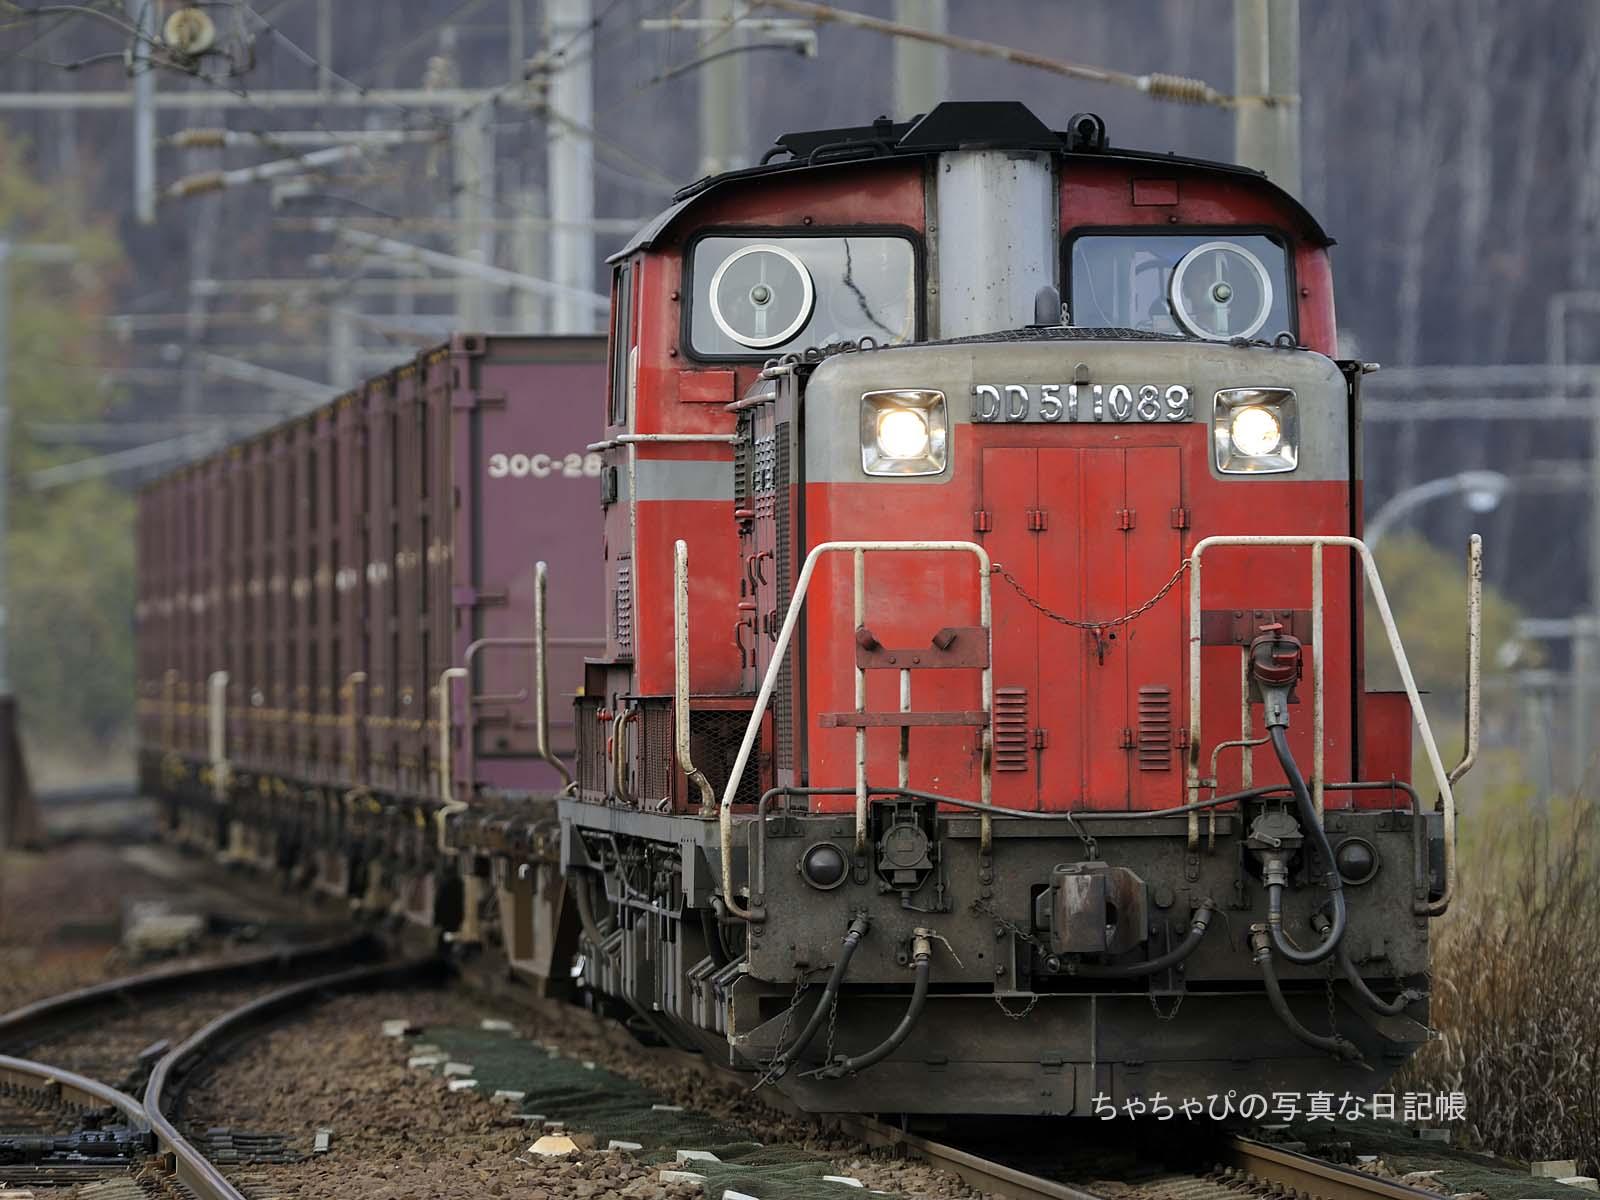 DD51 1089